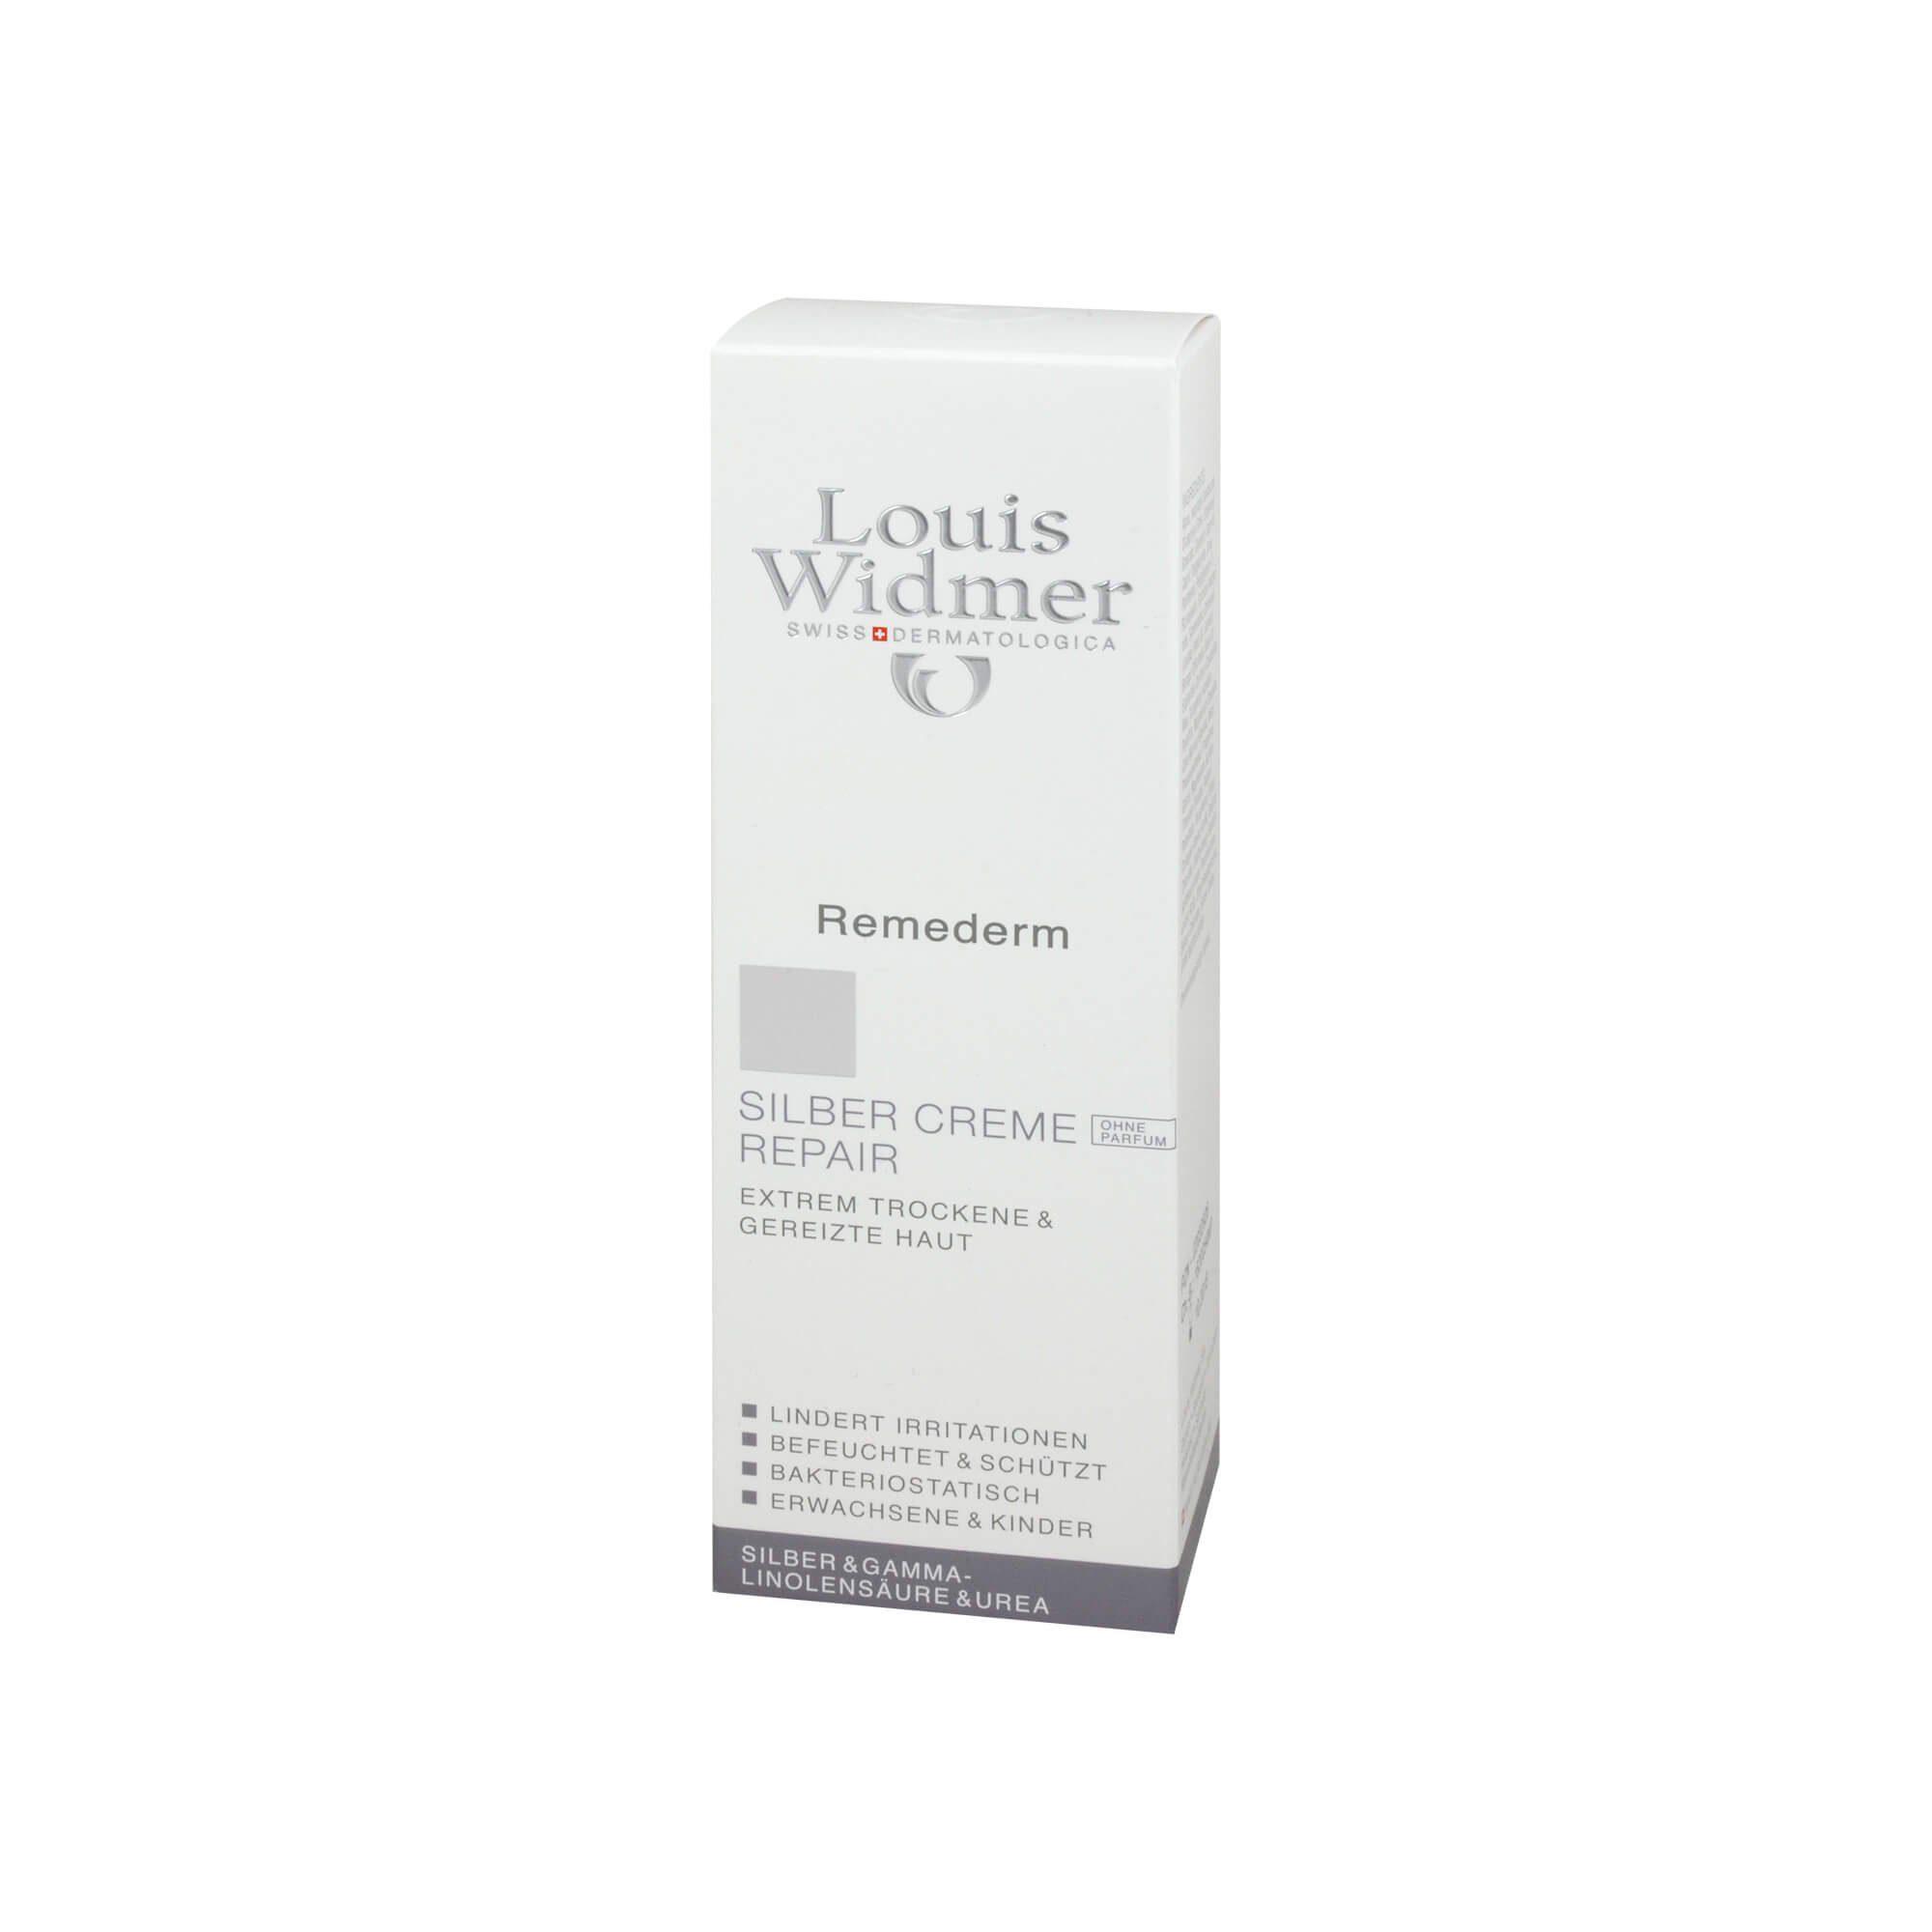 Widmer Remederm Silber Creme Repair unparfümiert, 75 ml